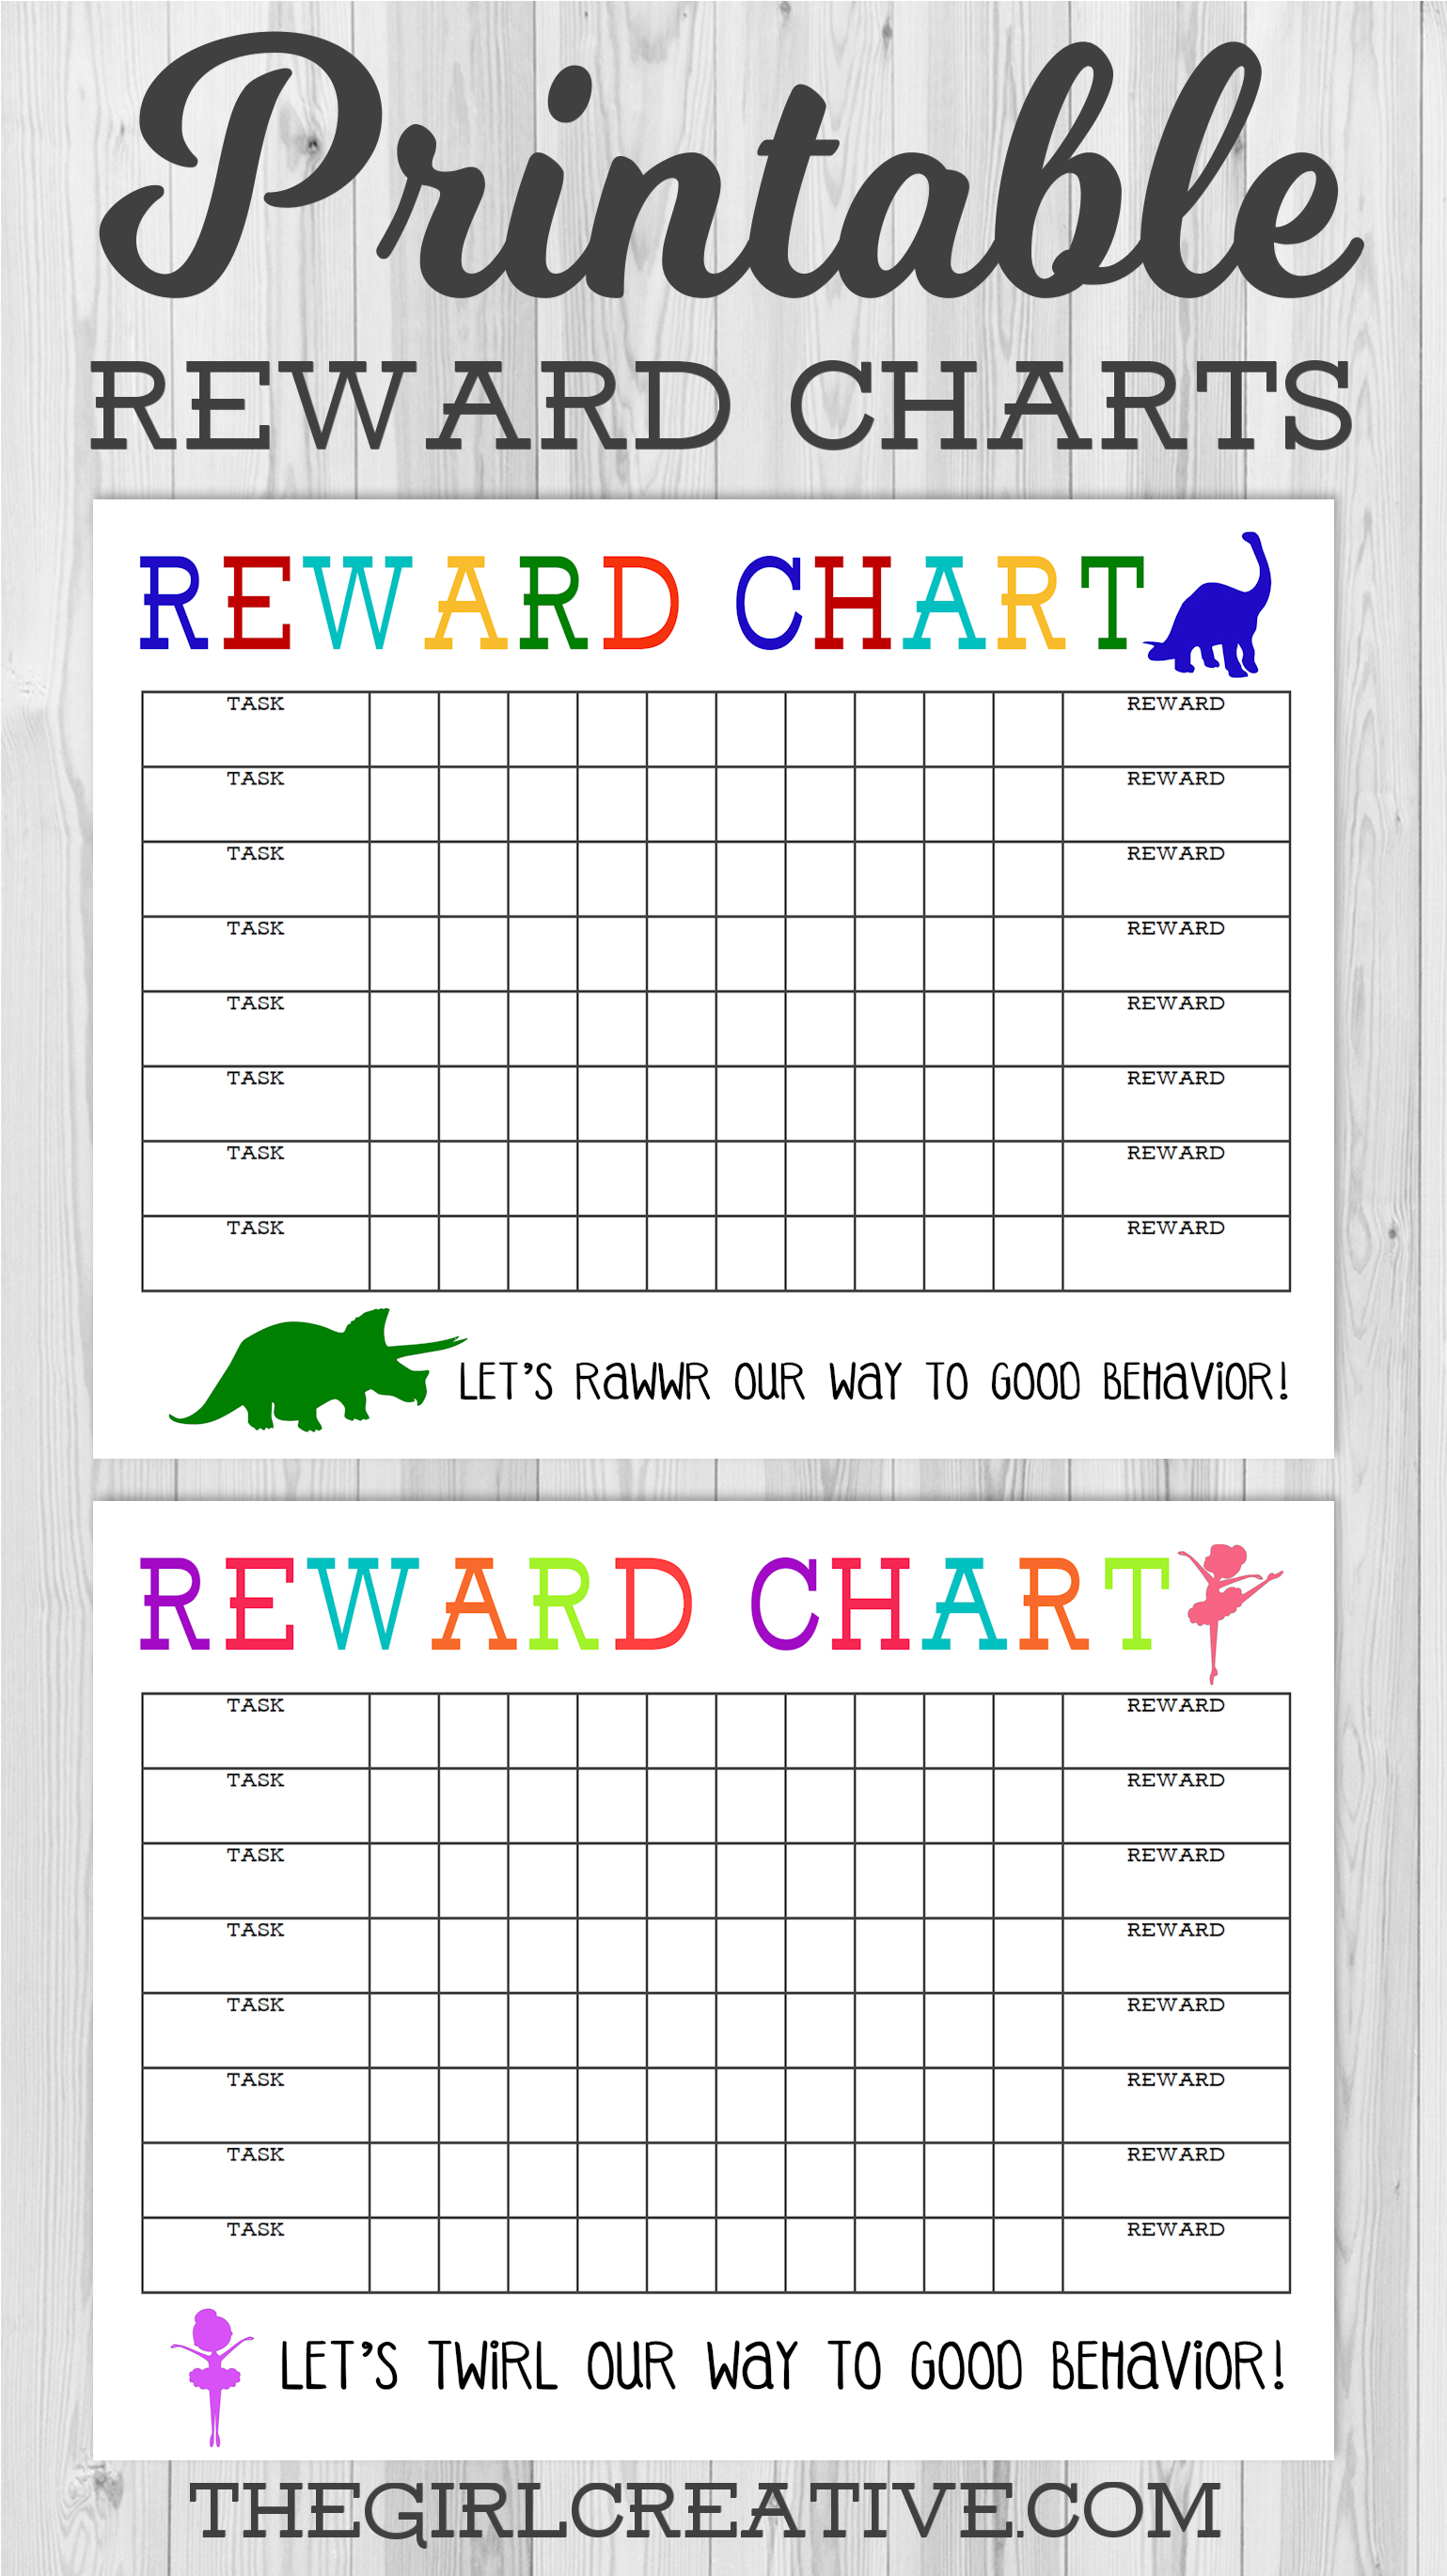 Printable Reward Chart - The Girl Creative - Free Printable Charts